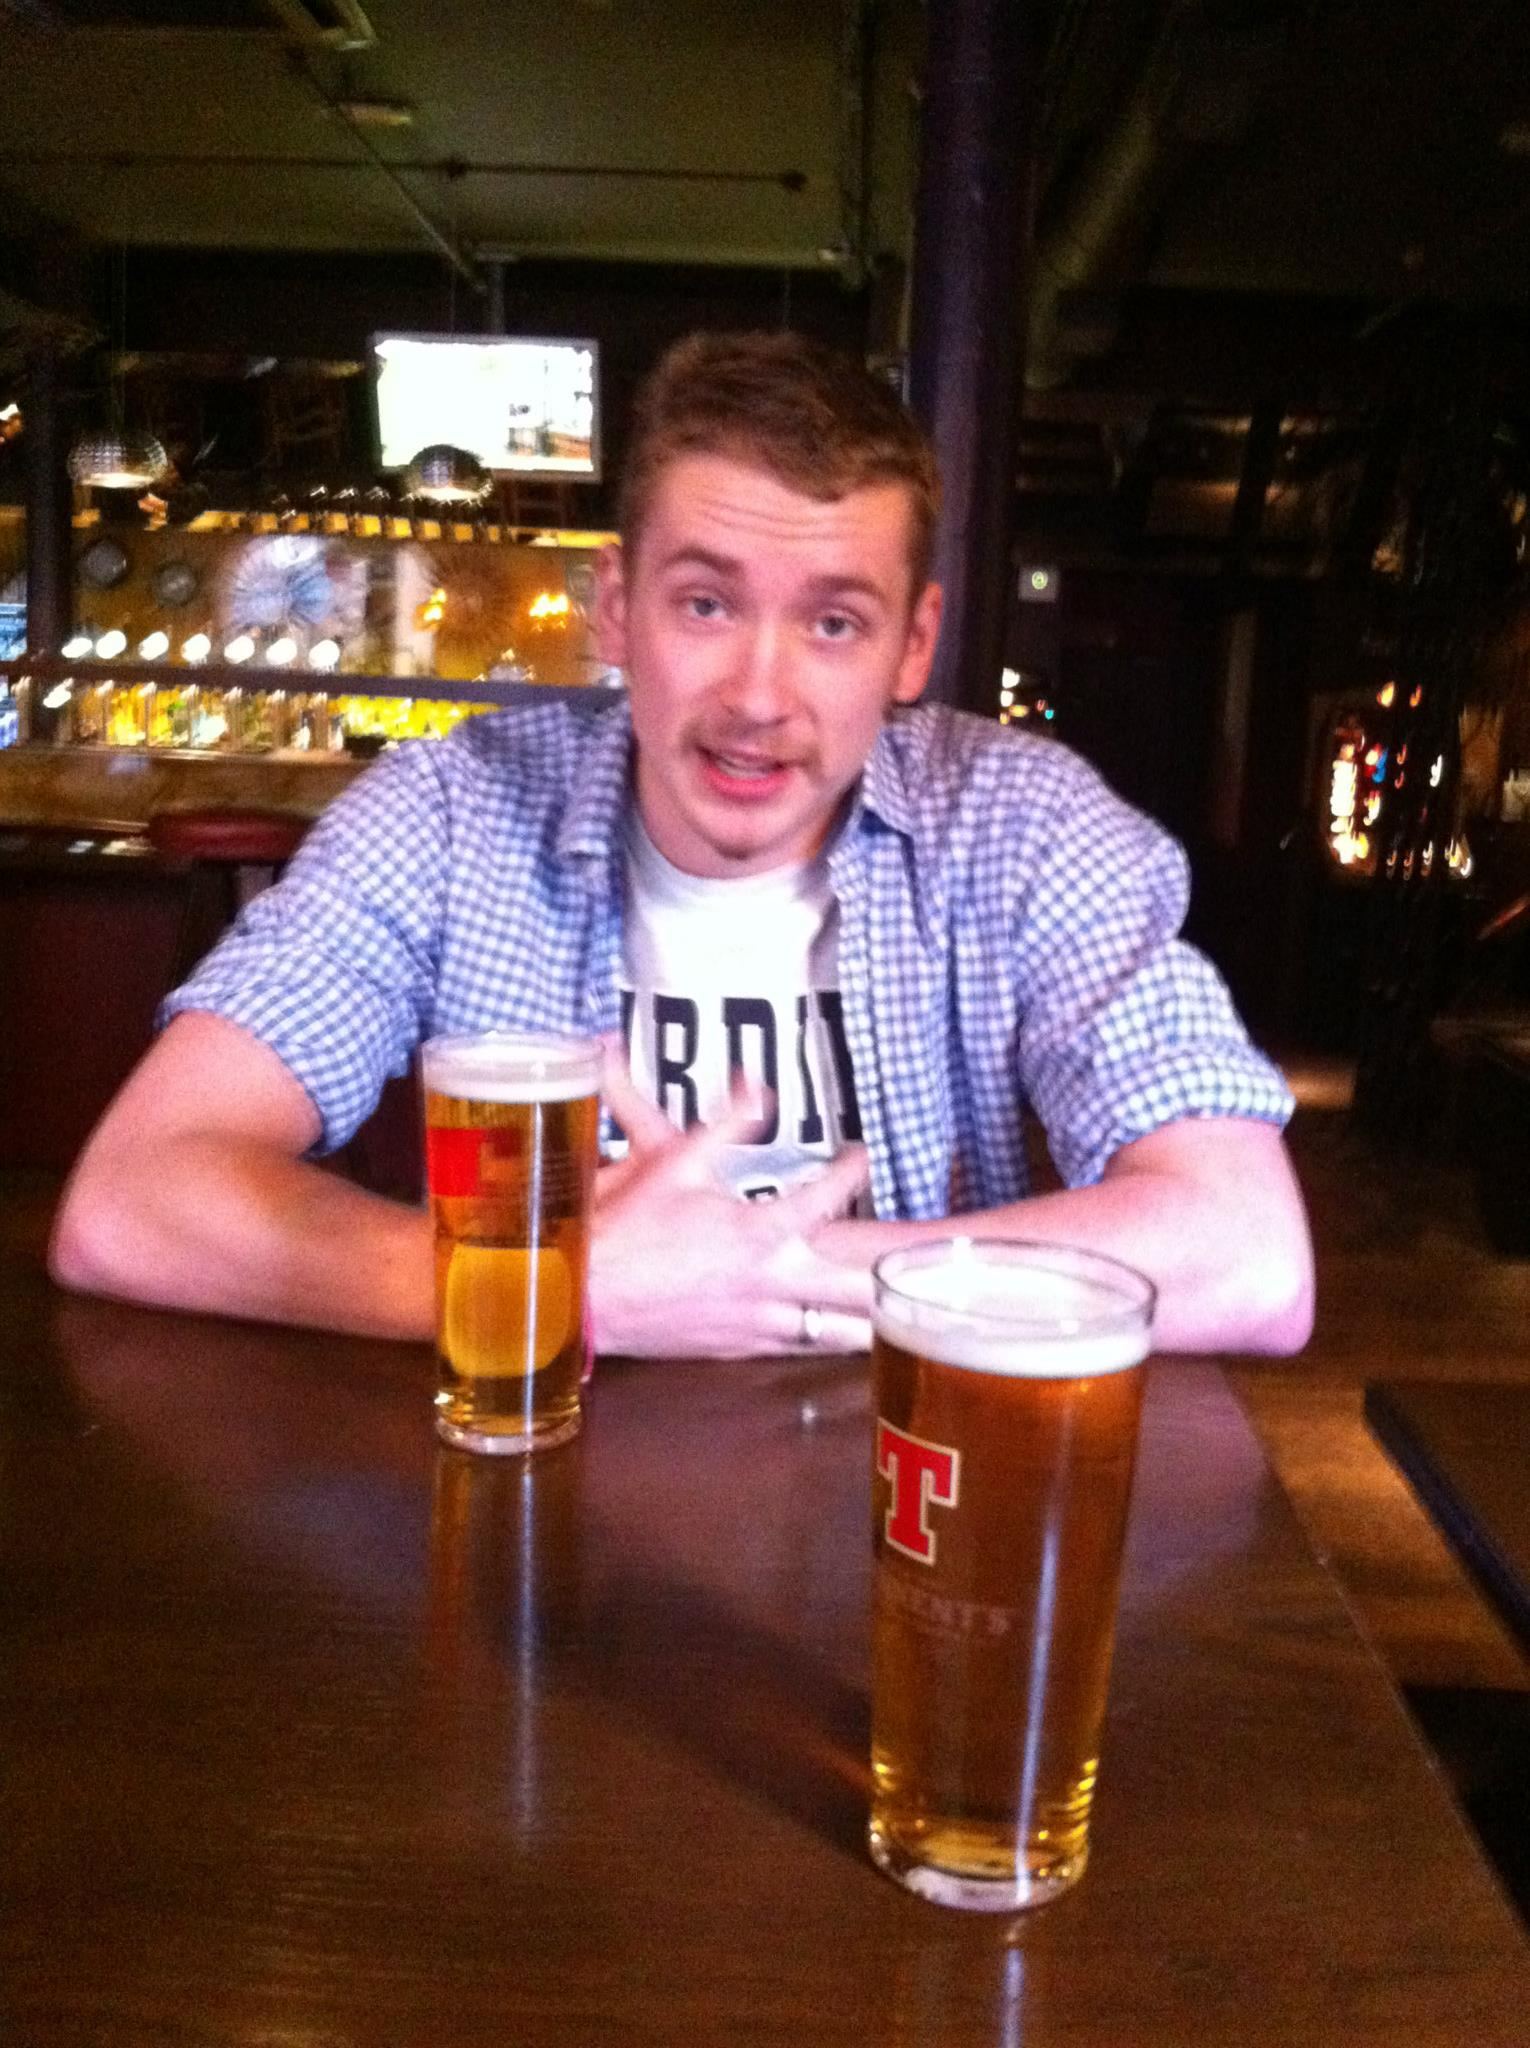 A man in a pub